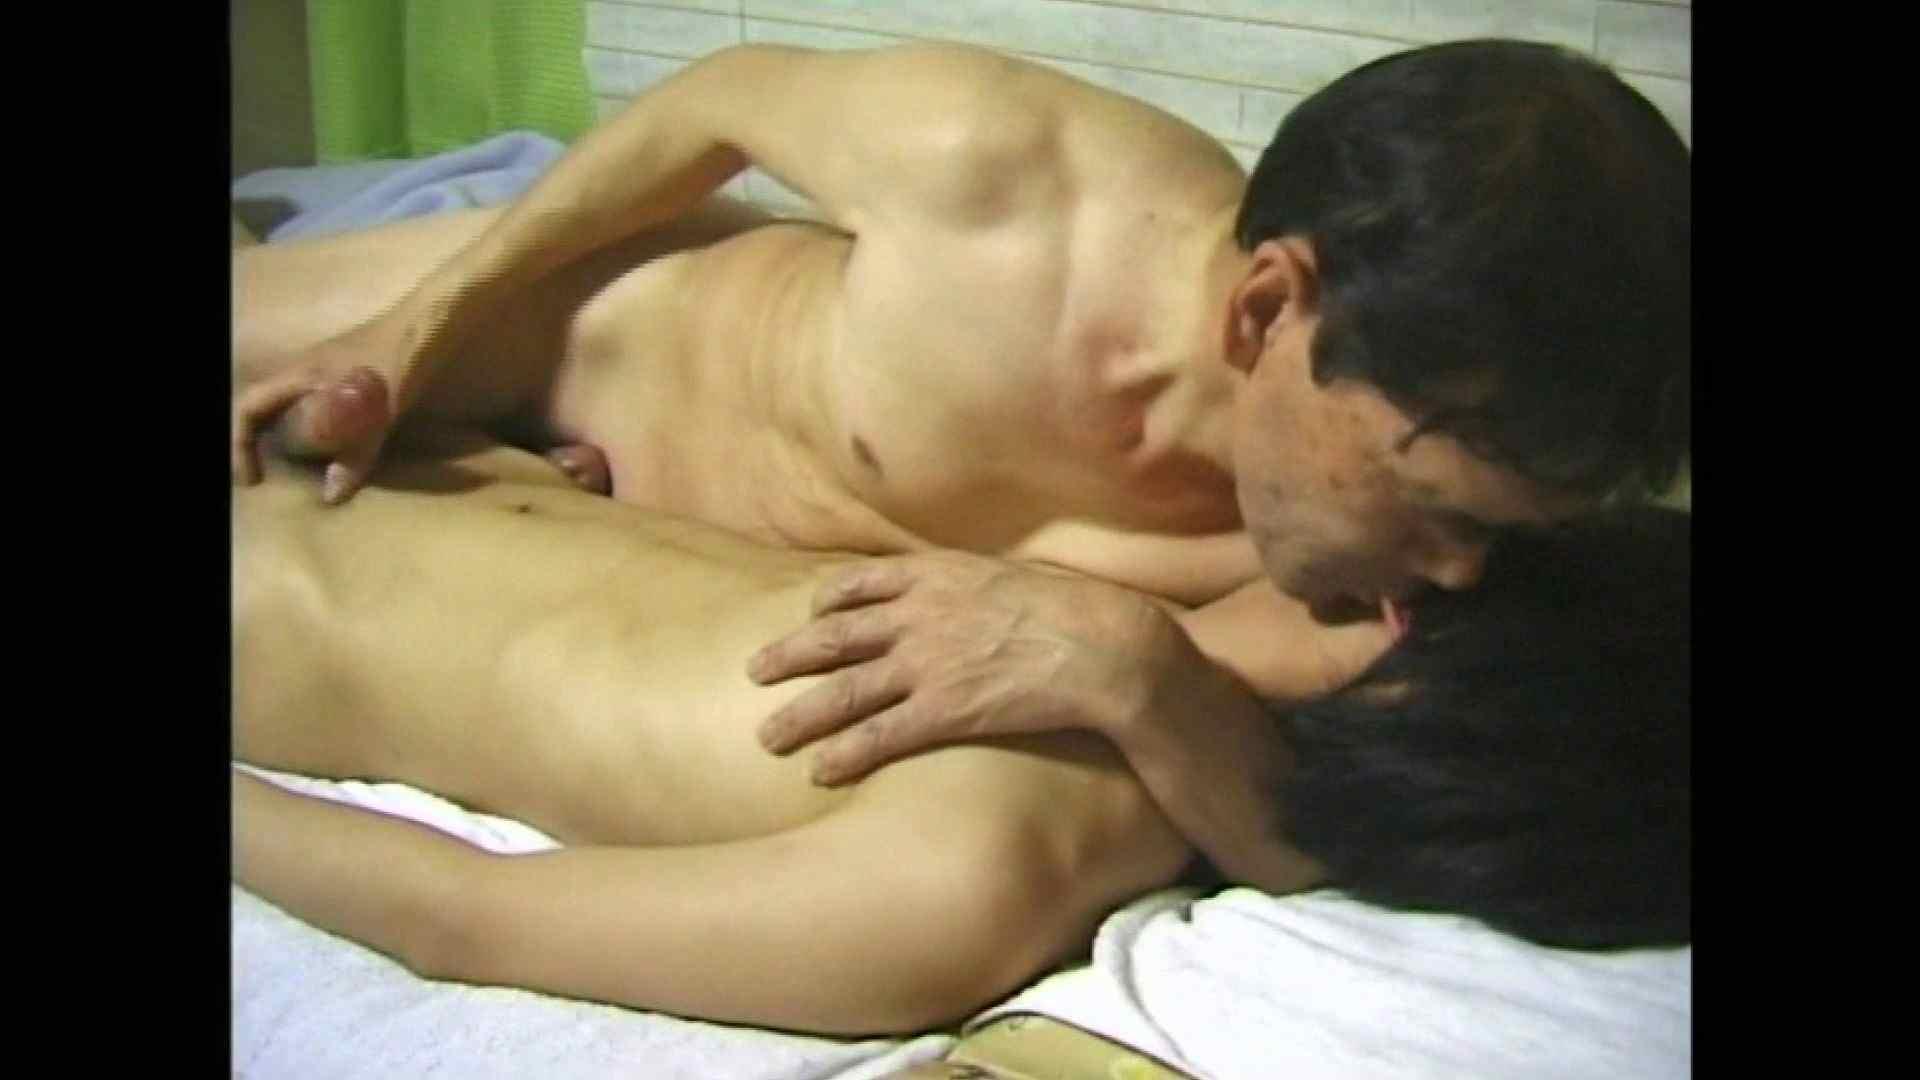 GAYBOY宏のオカズ倉庫Vol.1-2 ゲイのペニス ゲイ精子画像 60枚 31